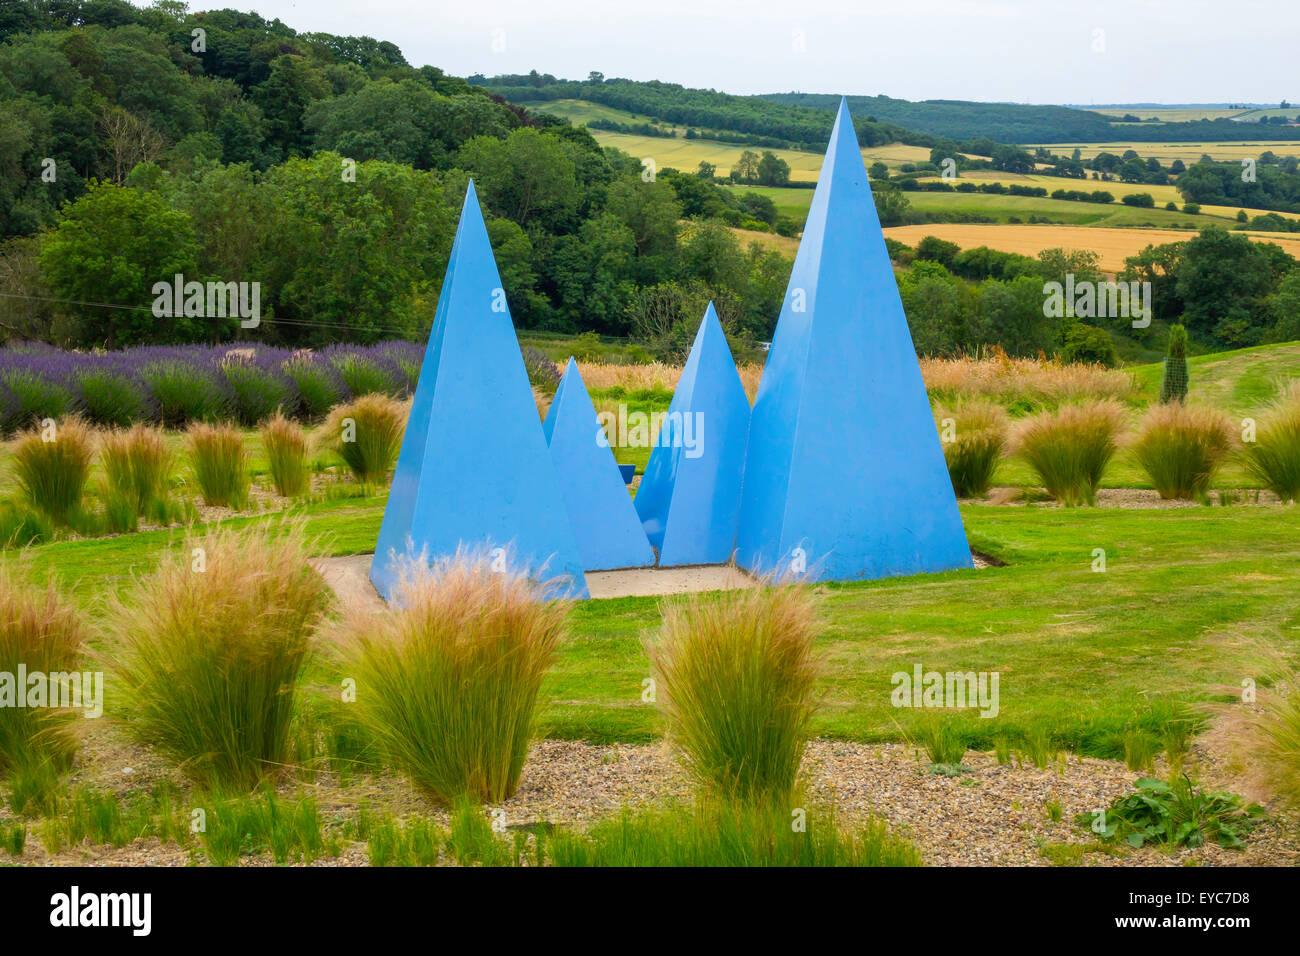 Blue pyramids mark the Memorial Garden for Lynne Goodwill co-founder at Yorkshire Lavender Terrington York UK - Stock Image